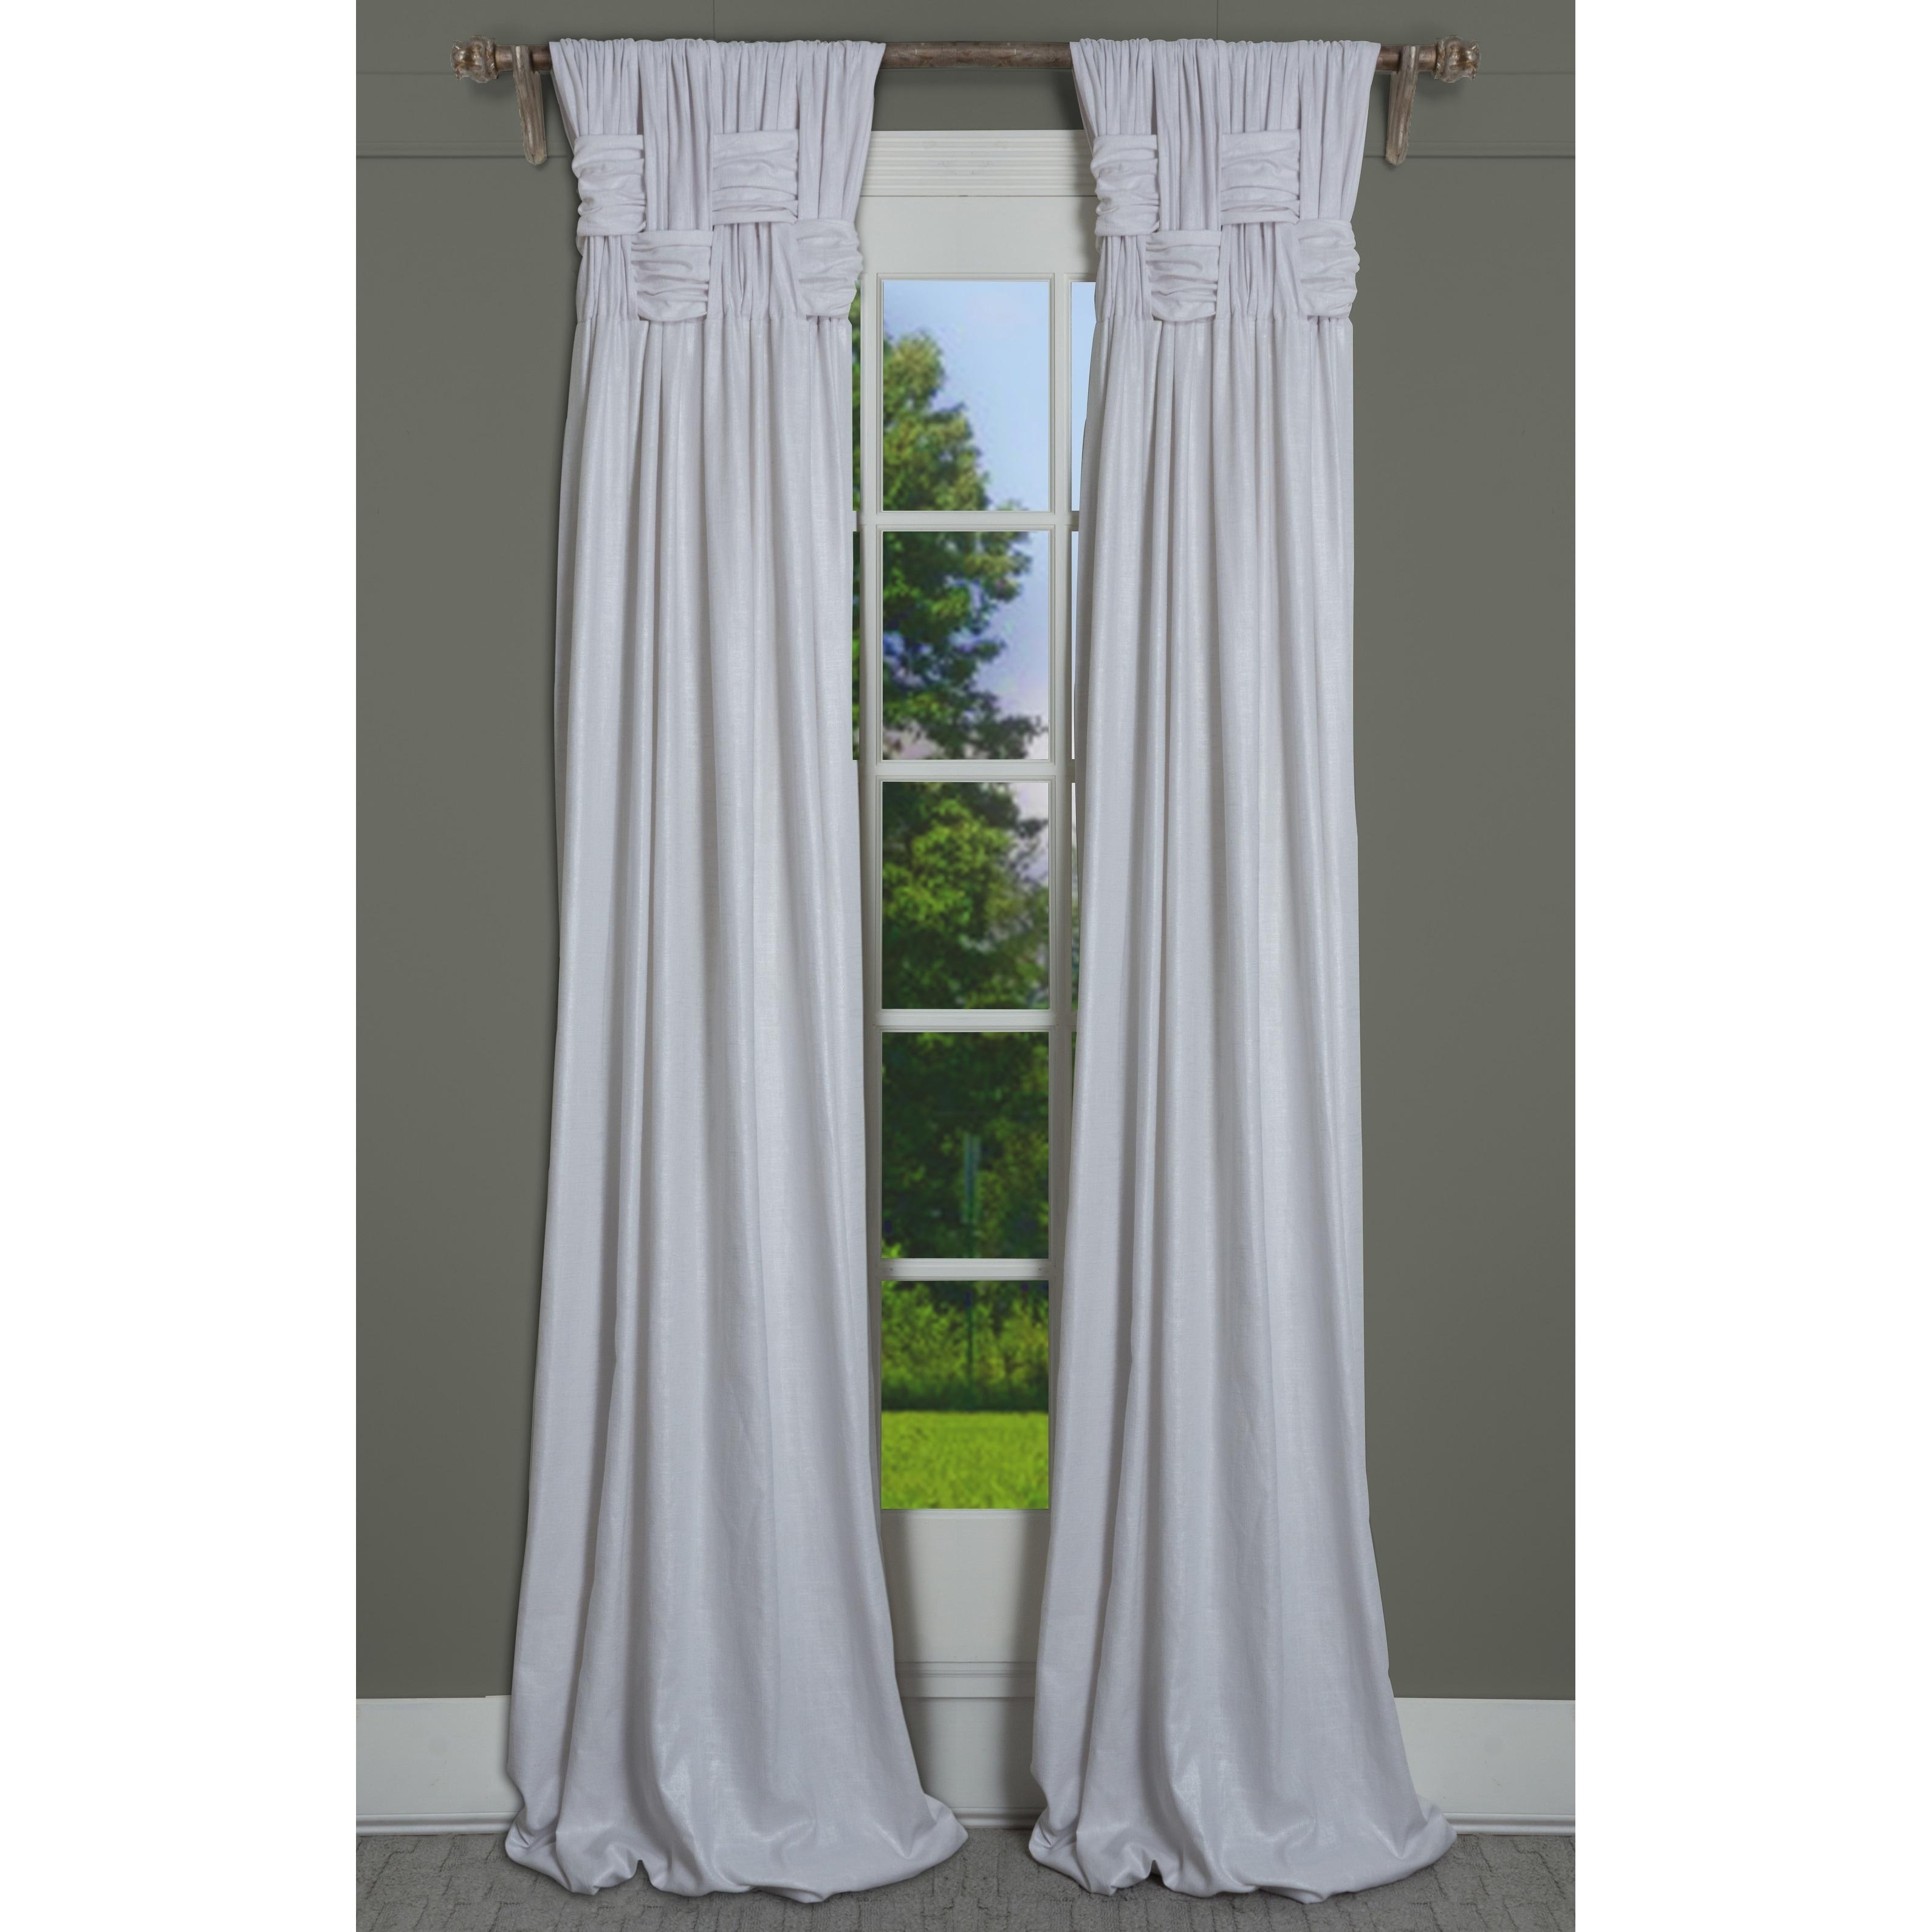 Rt Dressings Chelsea Brook Lustre Cotton Metallic Single Curtain Panel Inside Single Curtain Panels (Gallery 31 of 31)